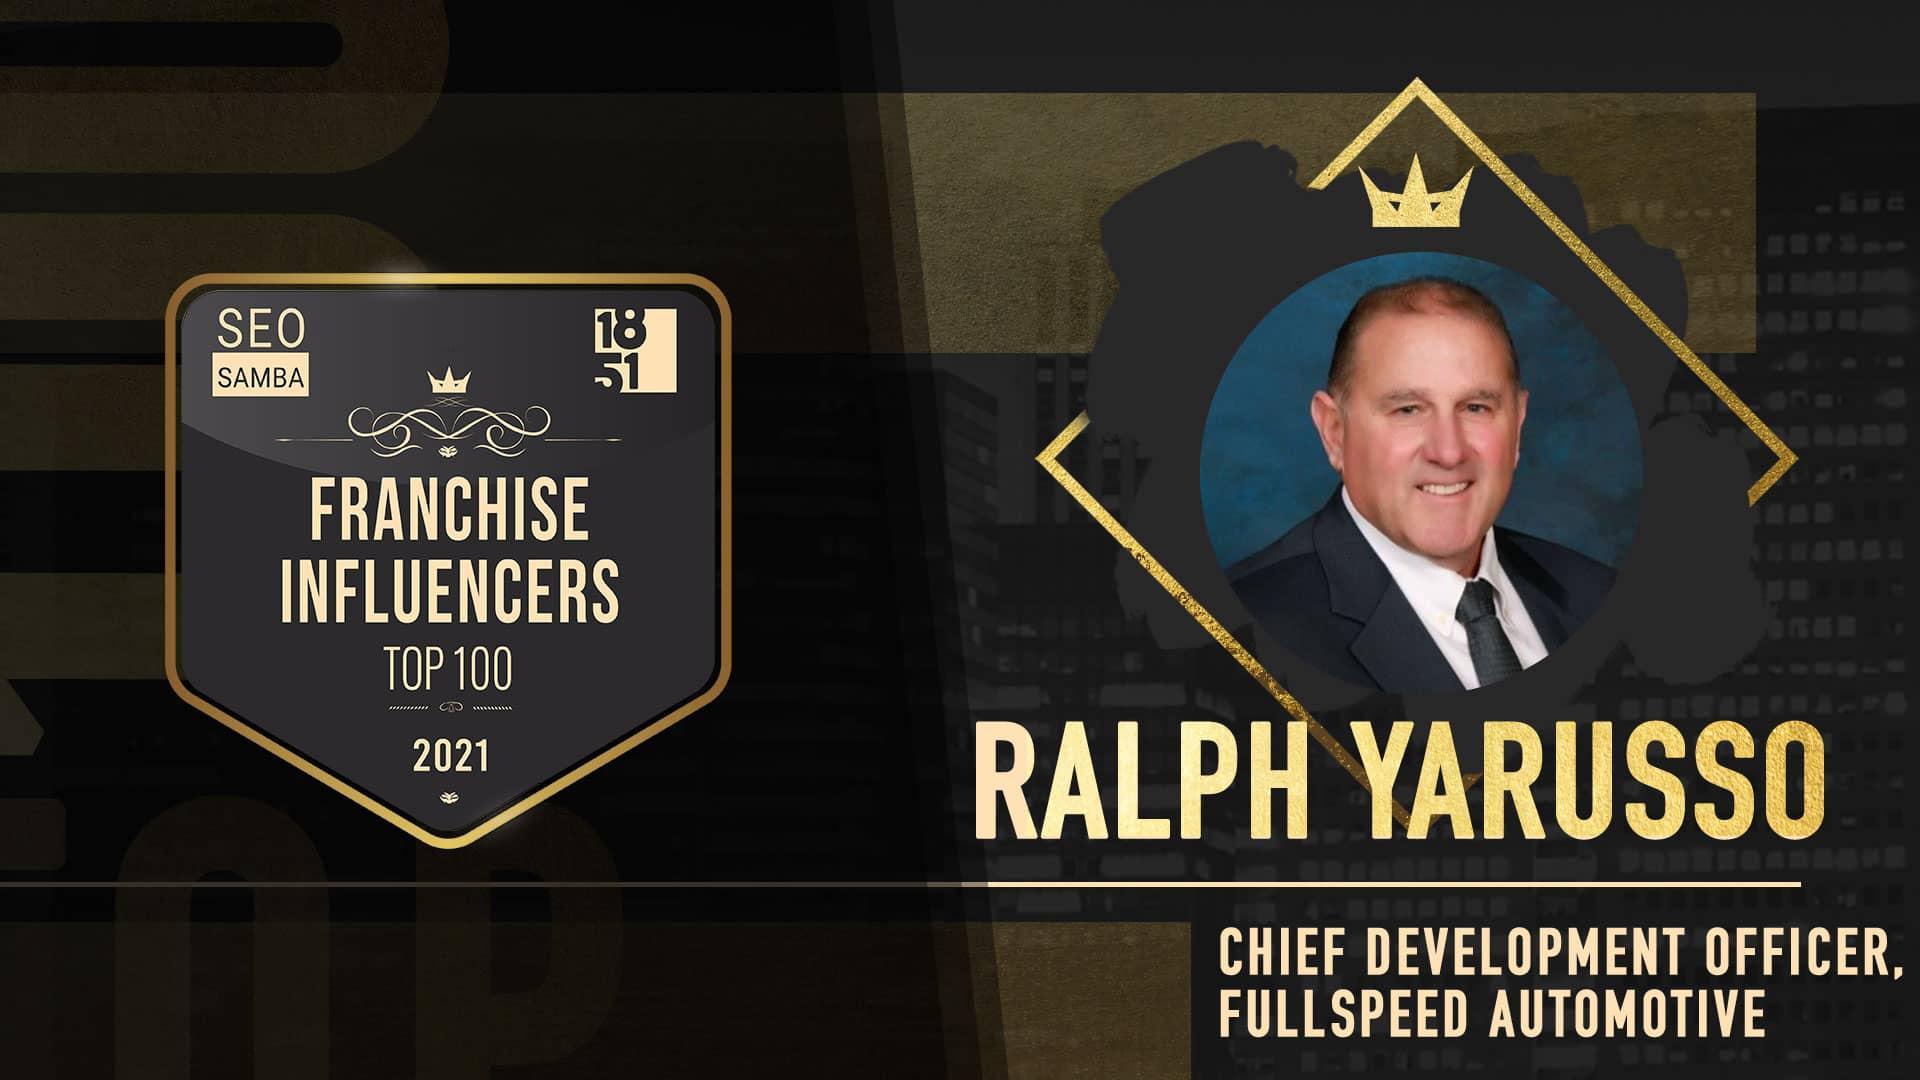 ralph-yarusso-full-speed-automotive